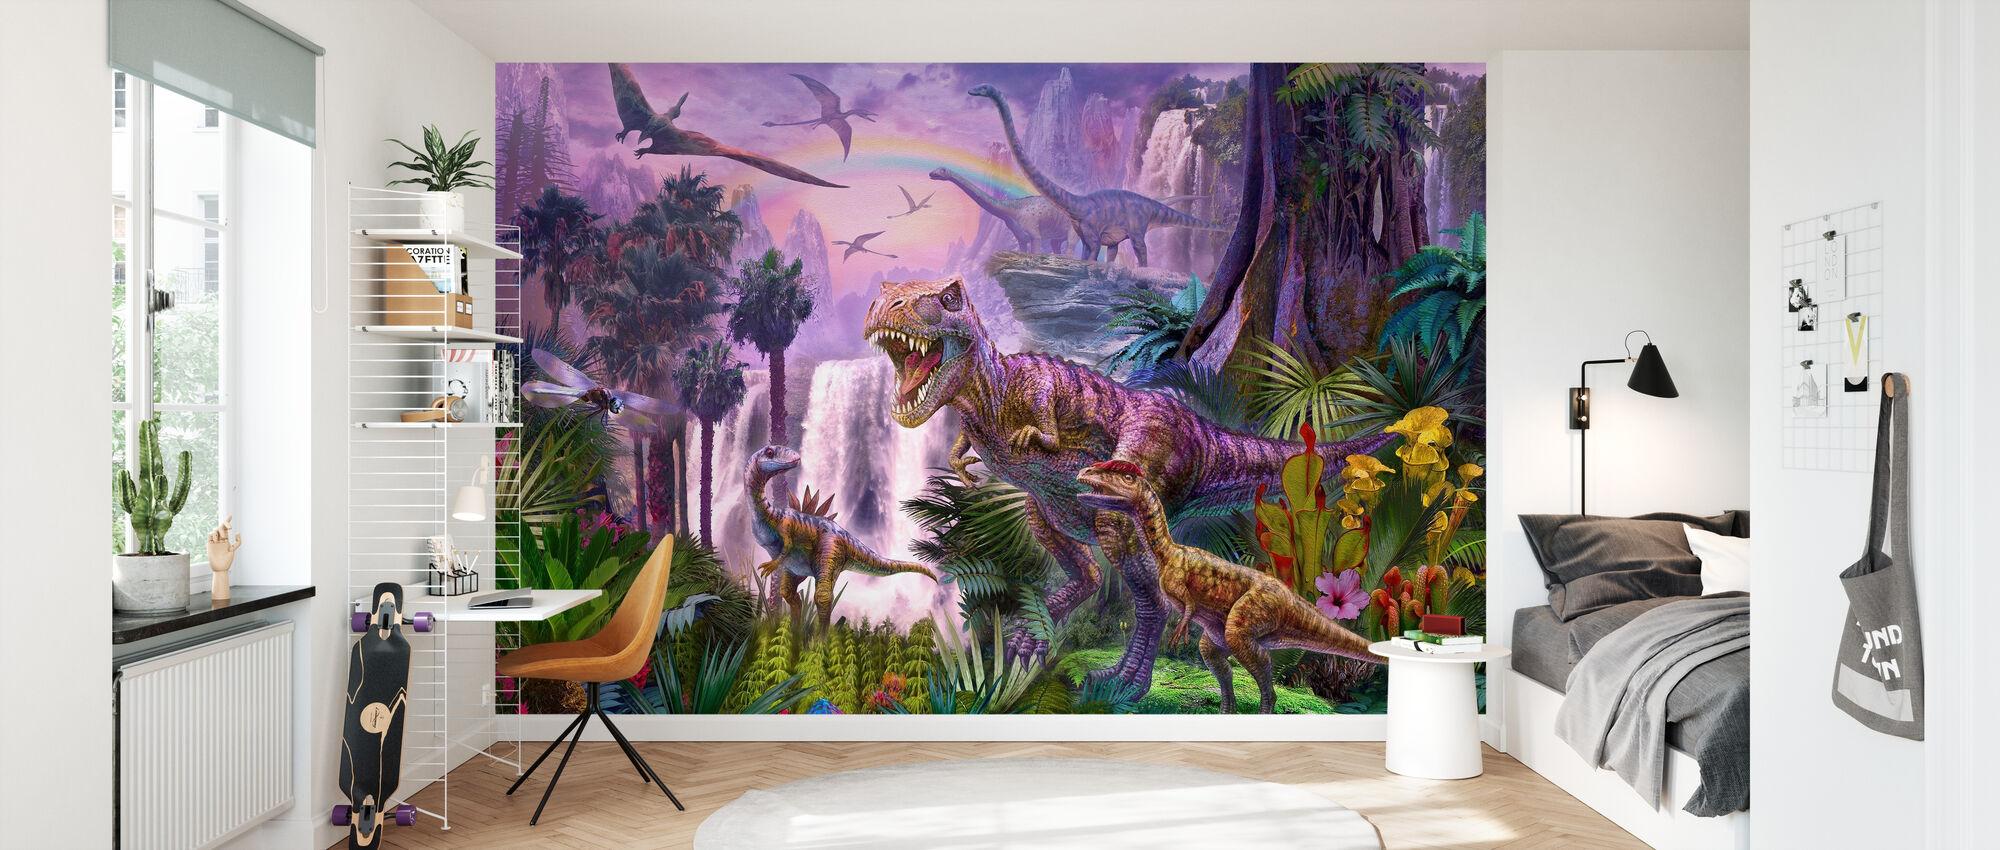 Paradise - Wallpaper - Kids Room